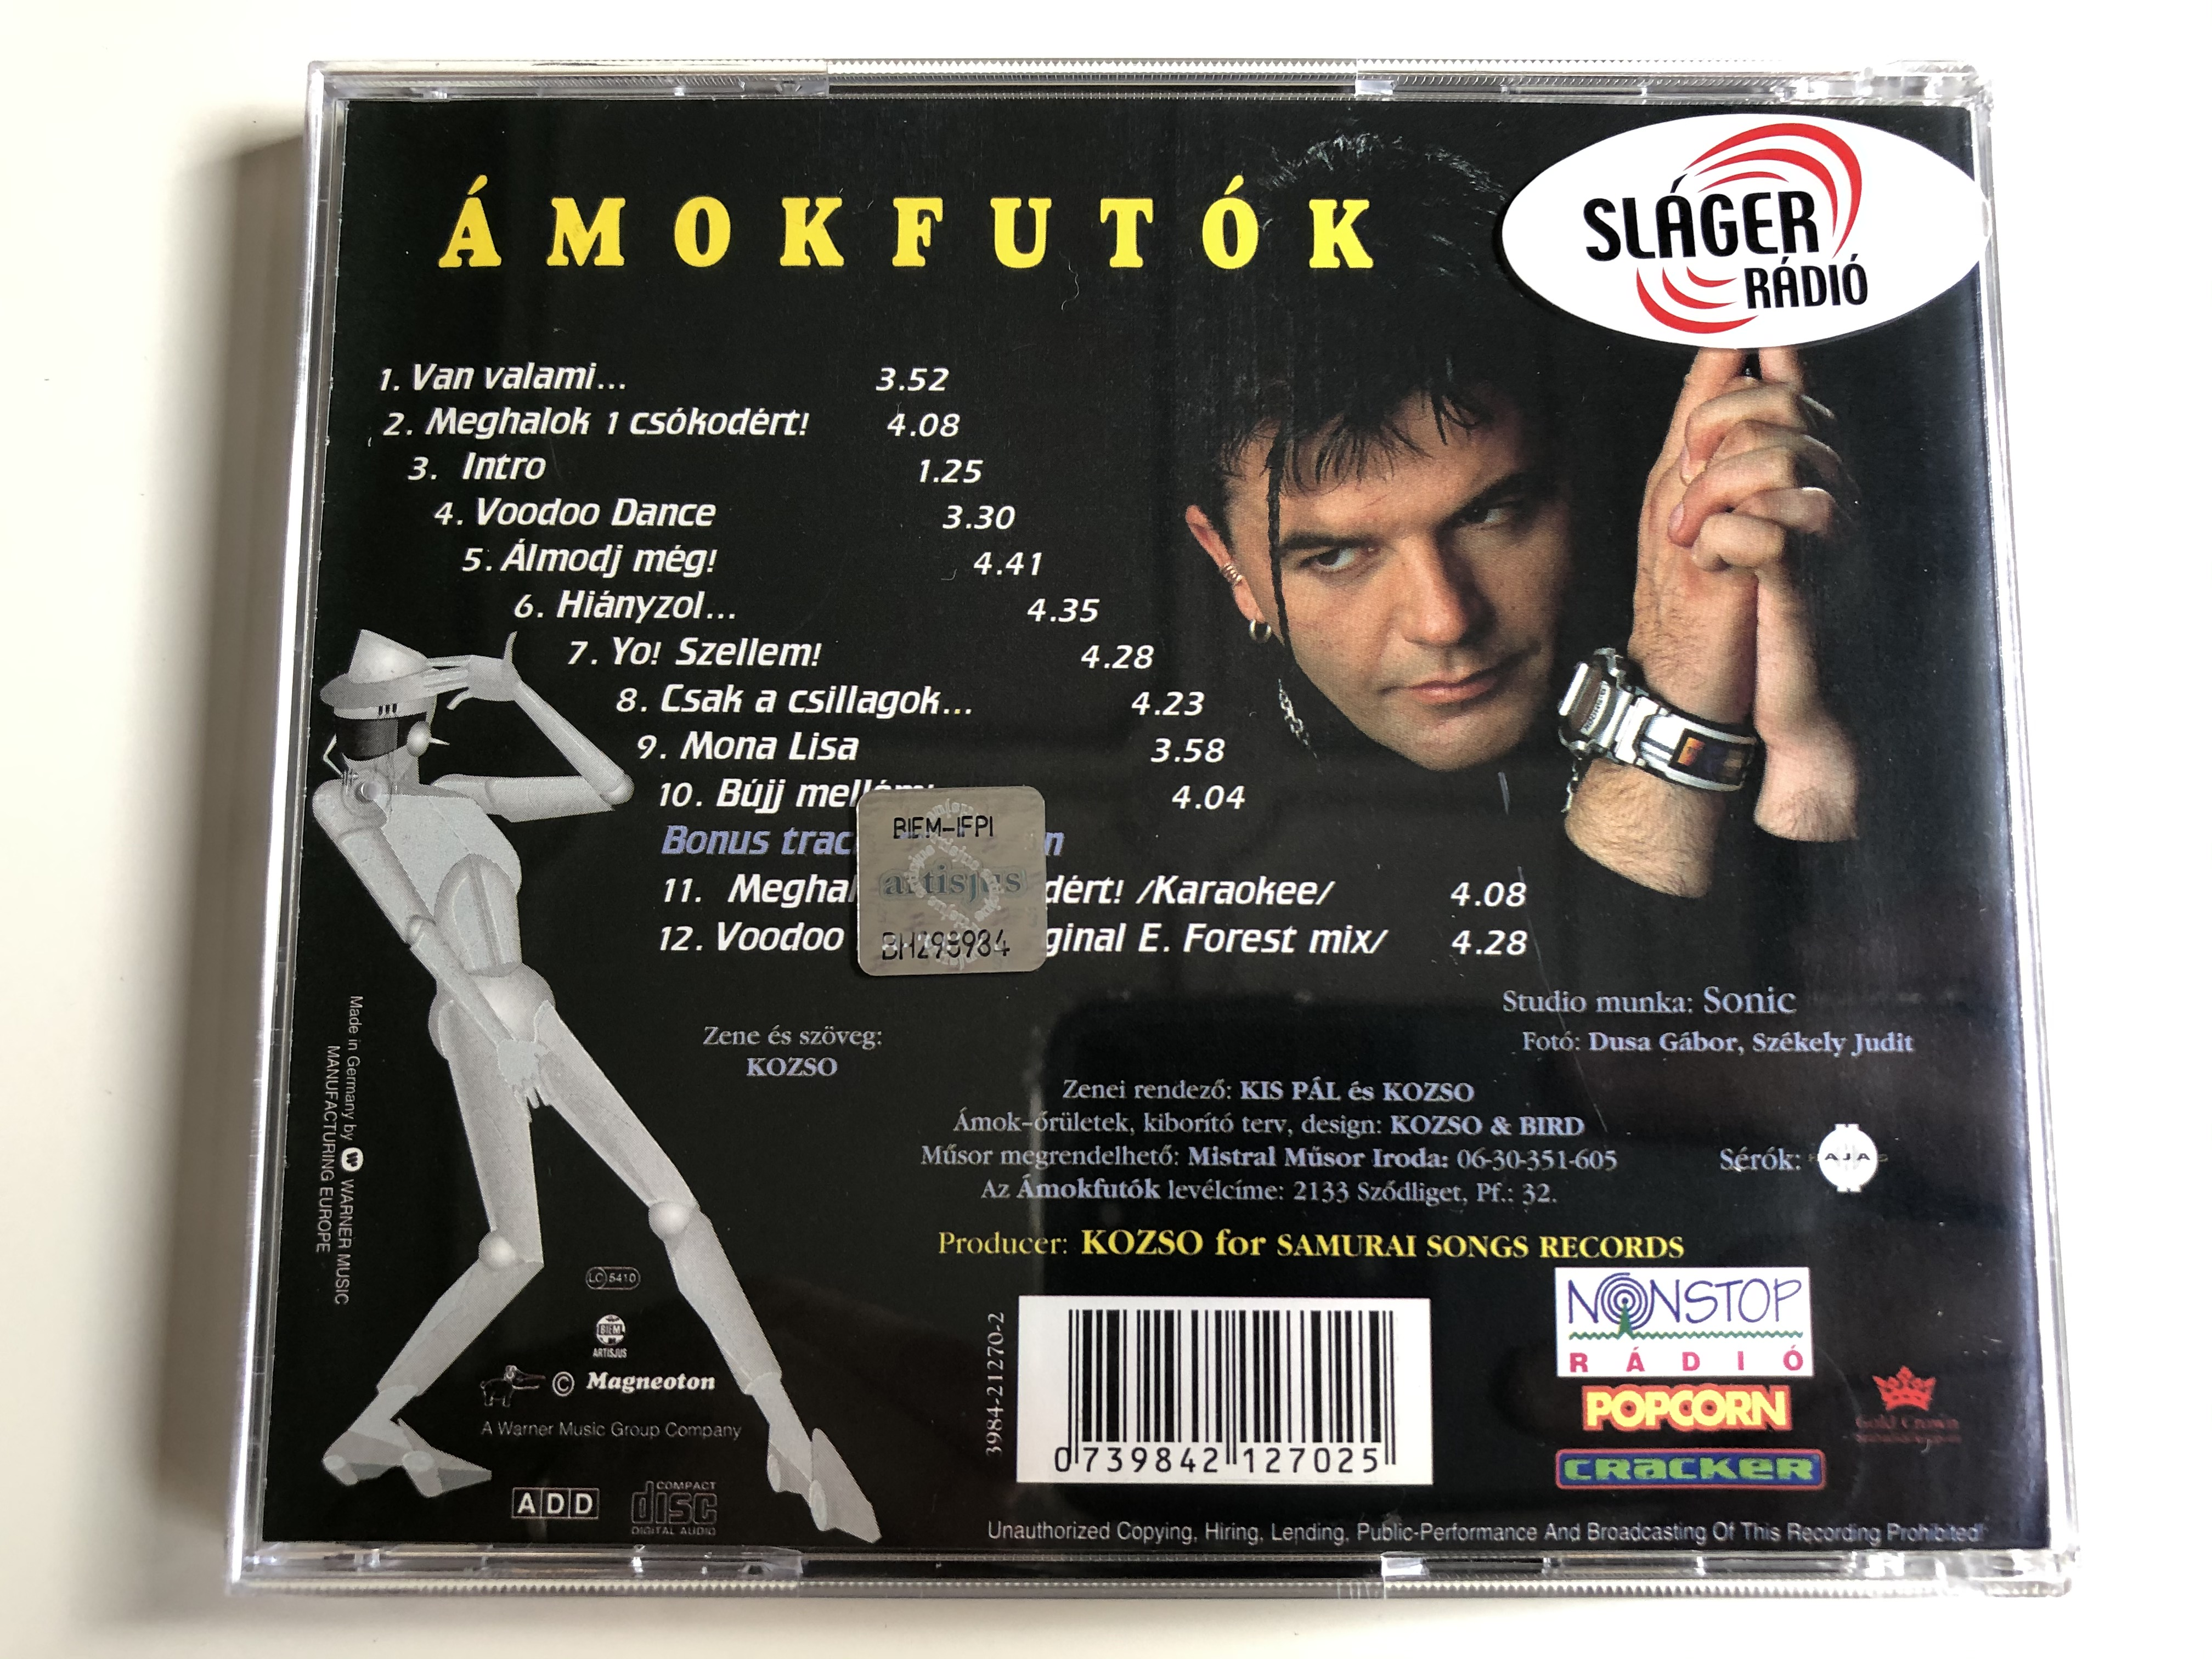 -mokfut-k-van-valami...-magneoton-audio-cd-1997-3984-21270-2-7-.jpg